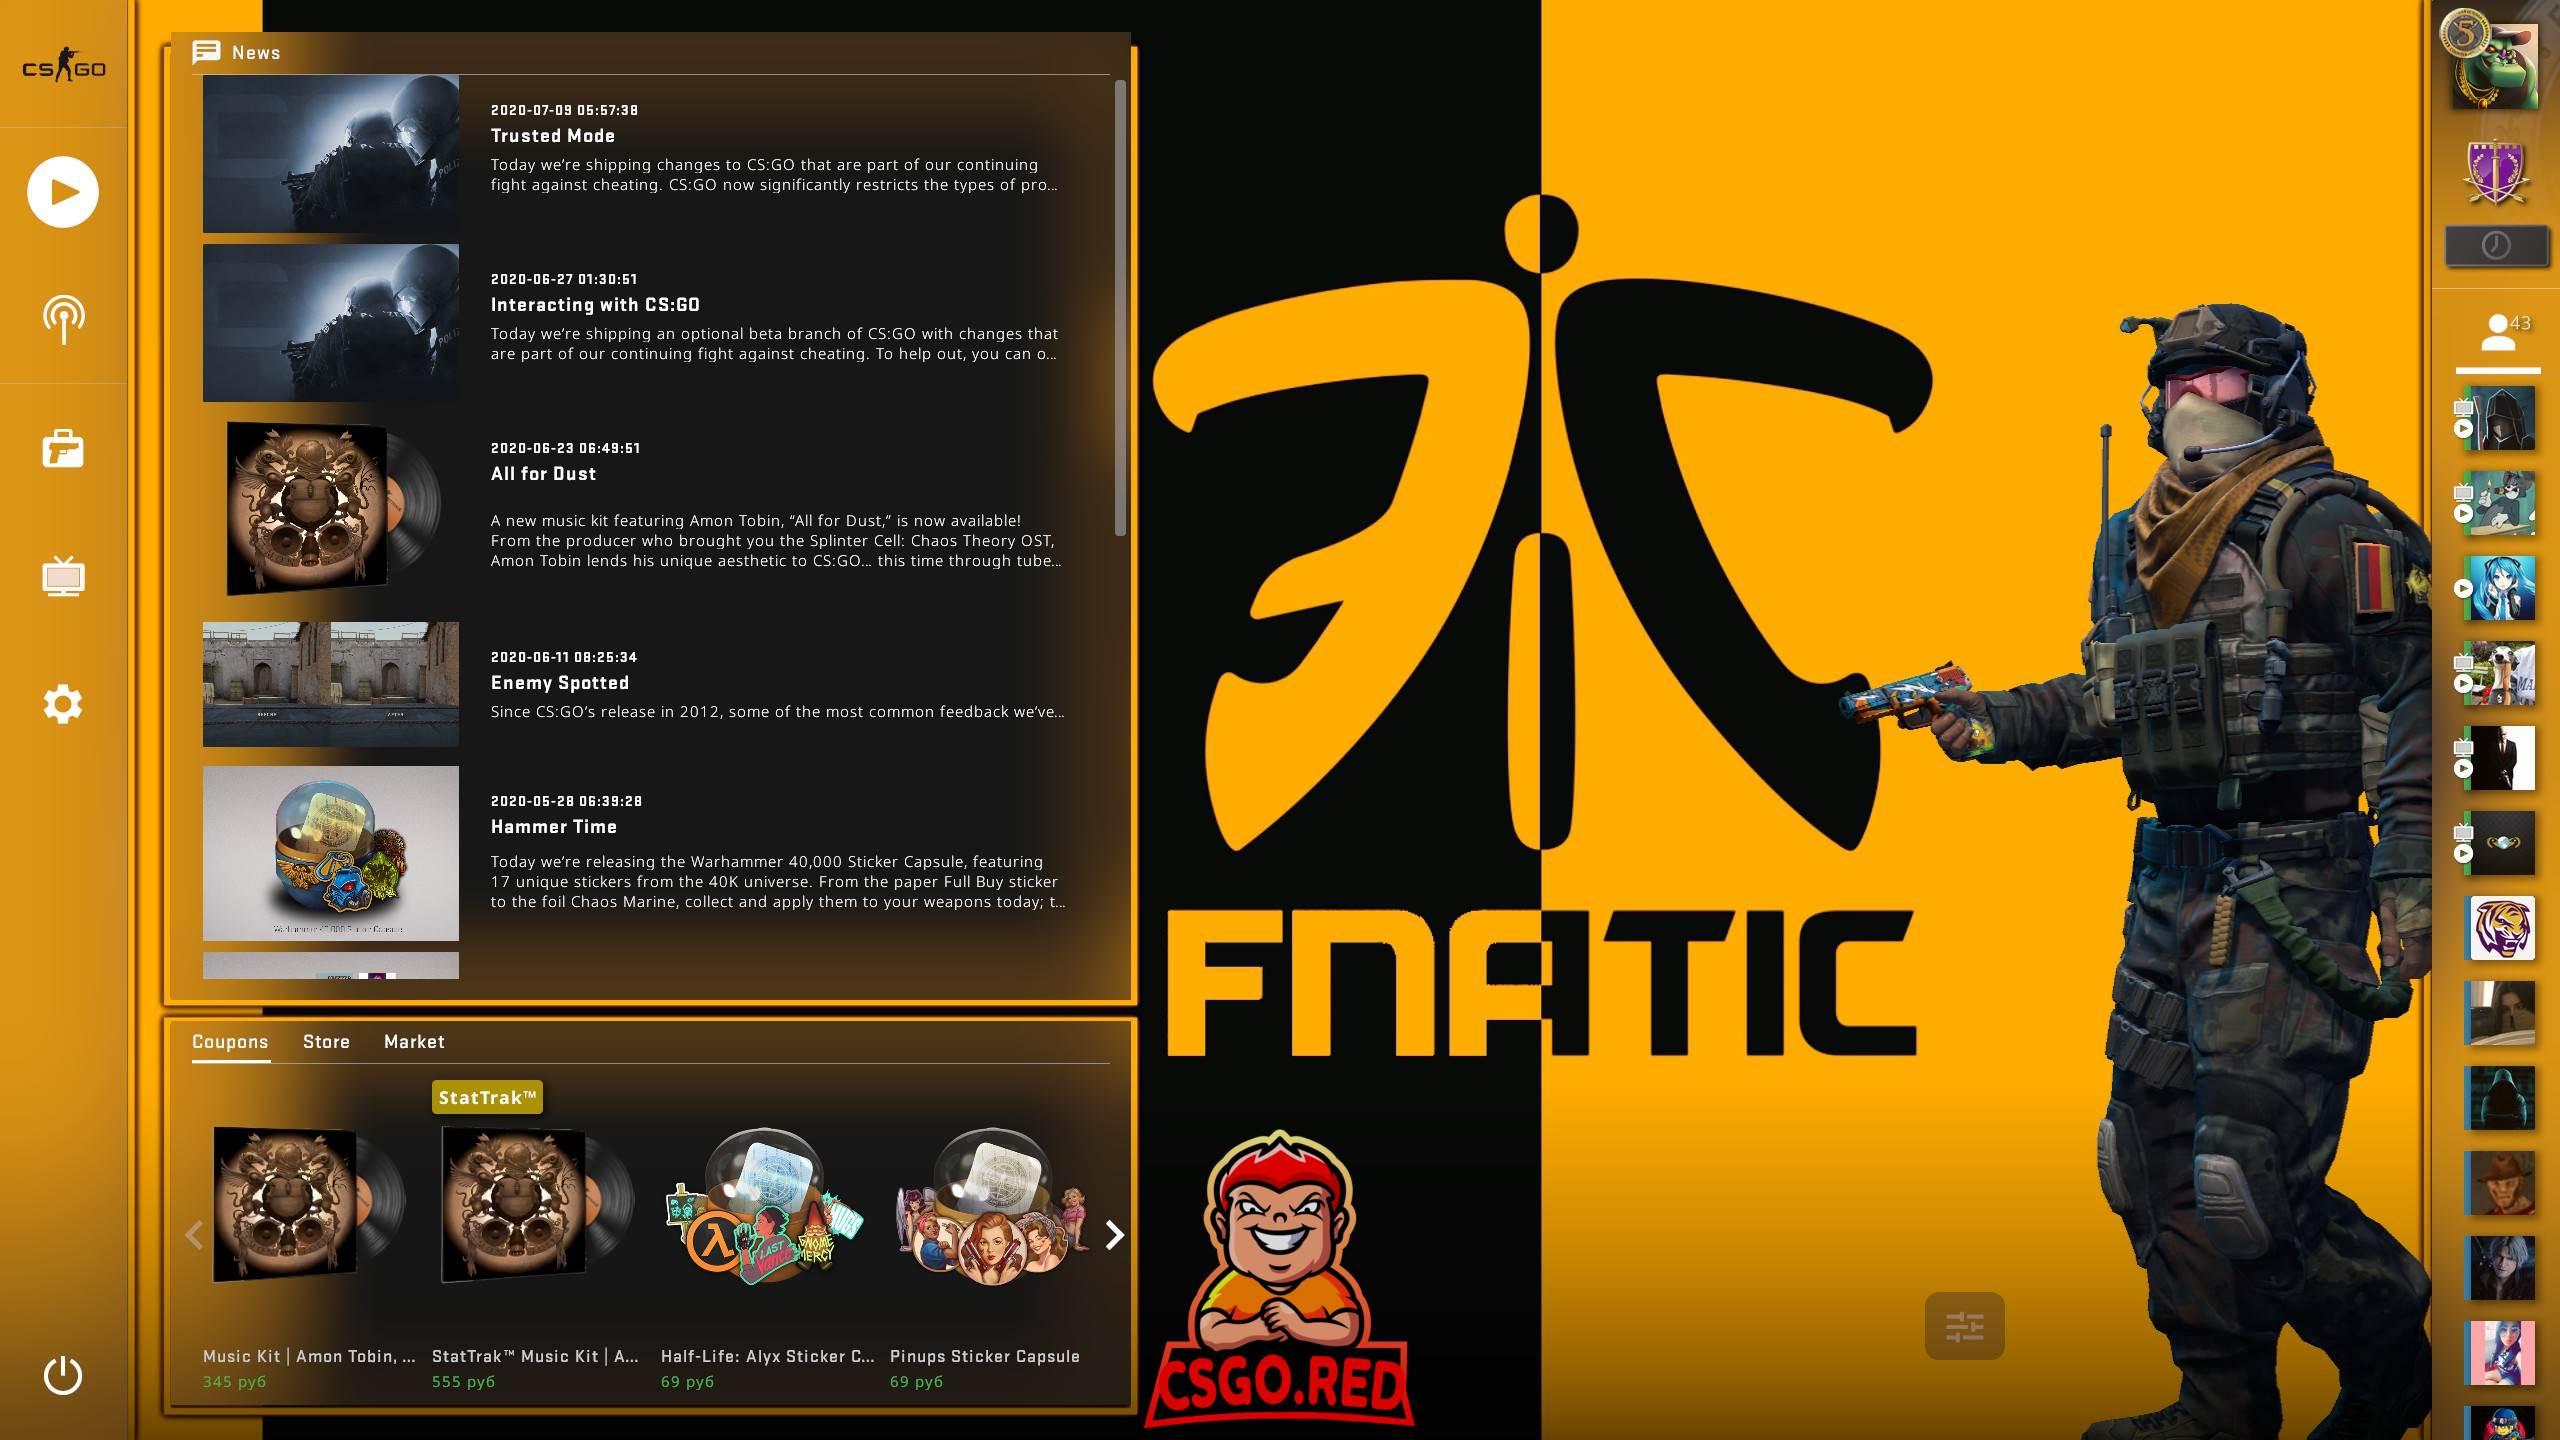 Fnatic Panorama UI Background